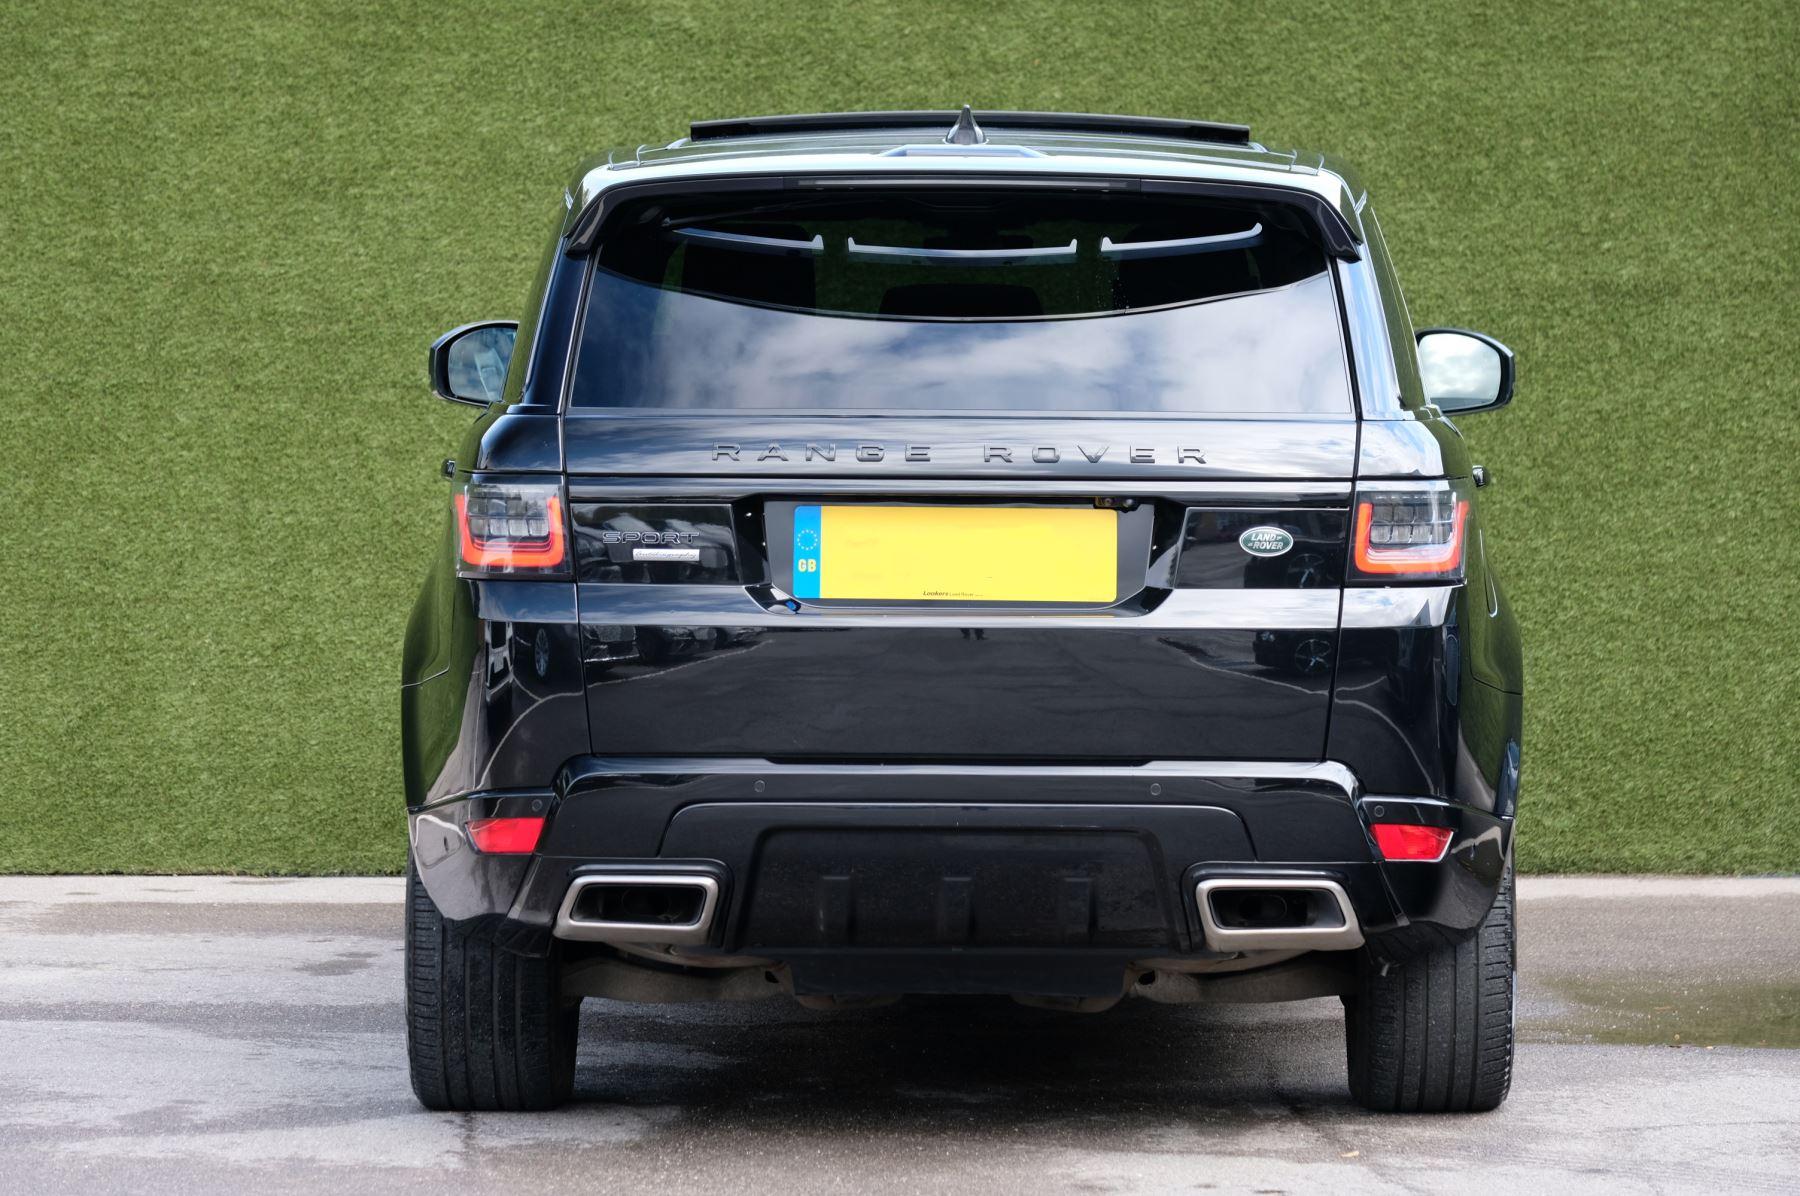 Land Rover Range Rover Sport 3.0 SDV6 Autobiography Dynamic 5dr image 4